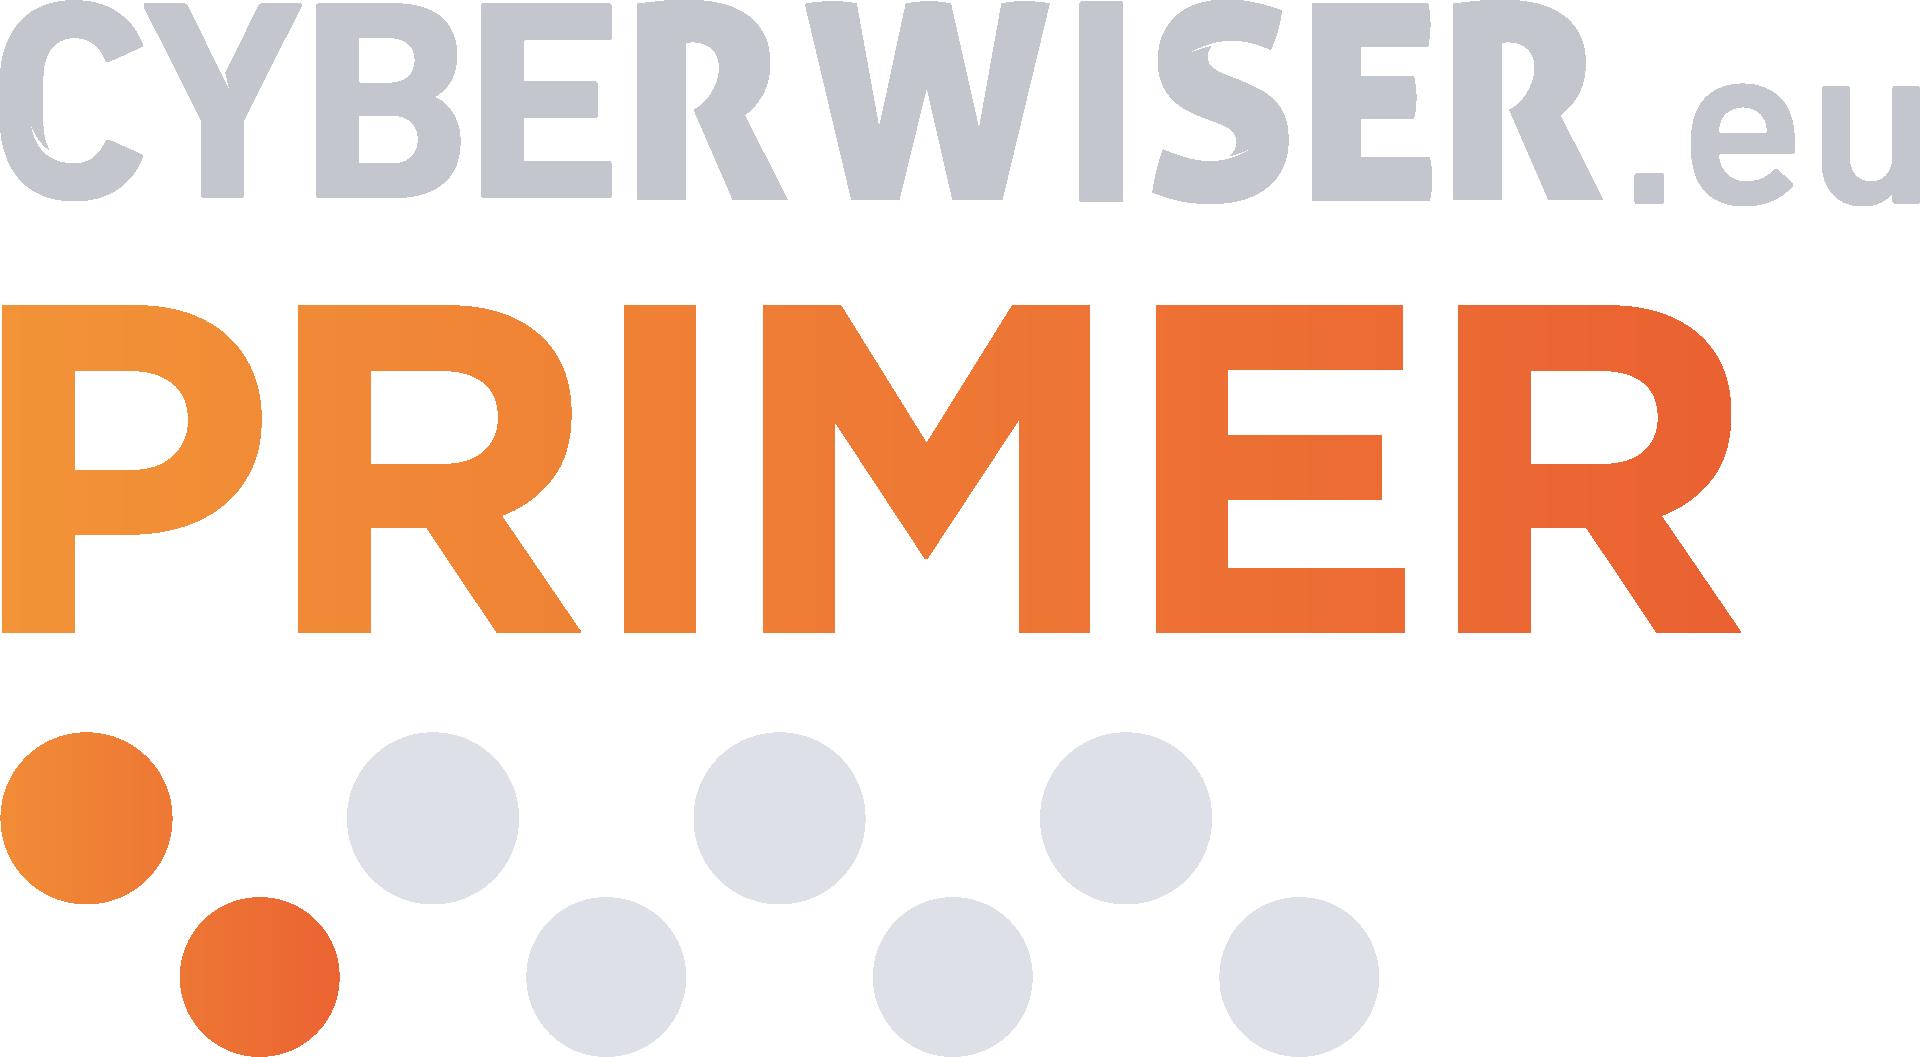 CYBERWISER.eu Primer